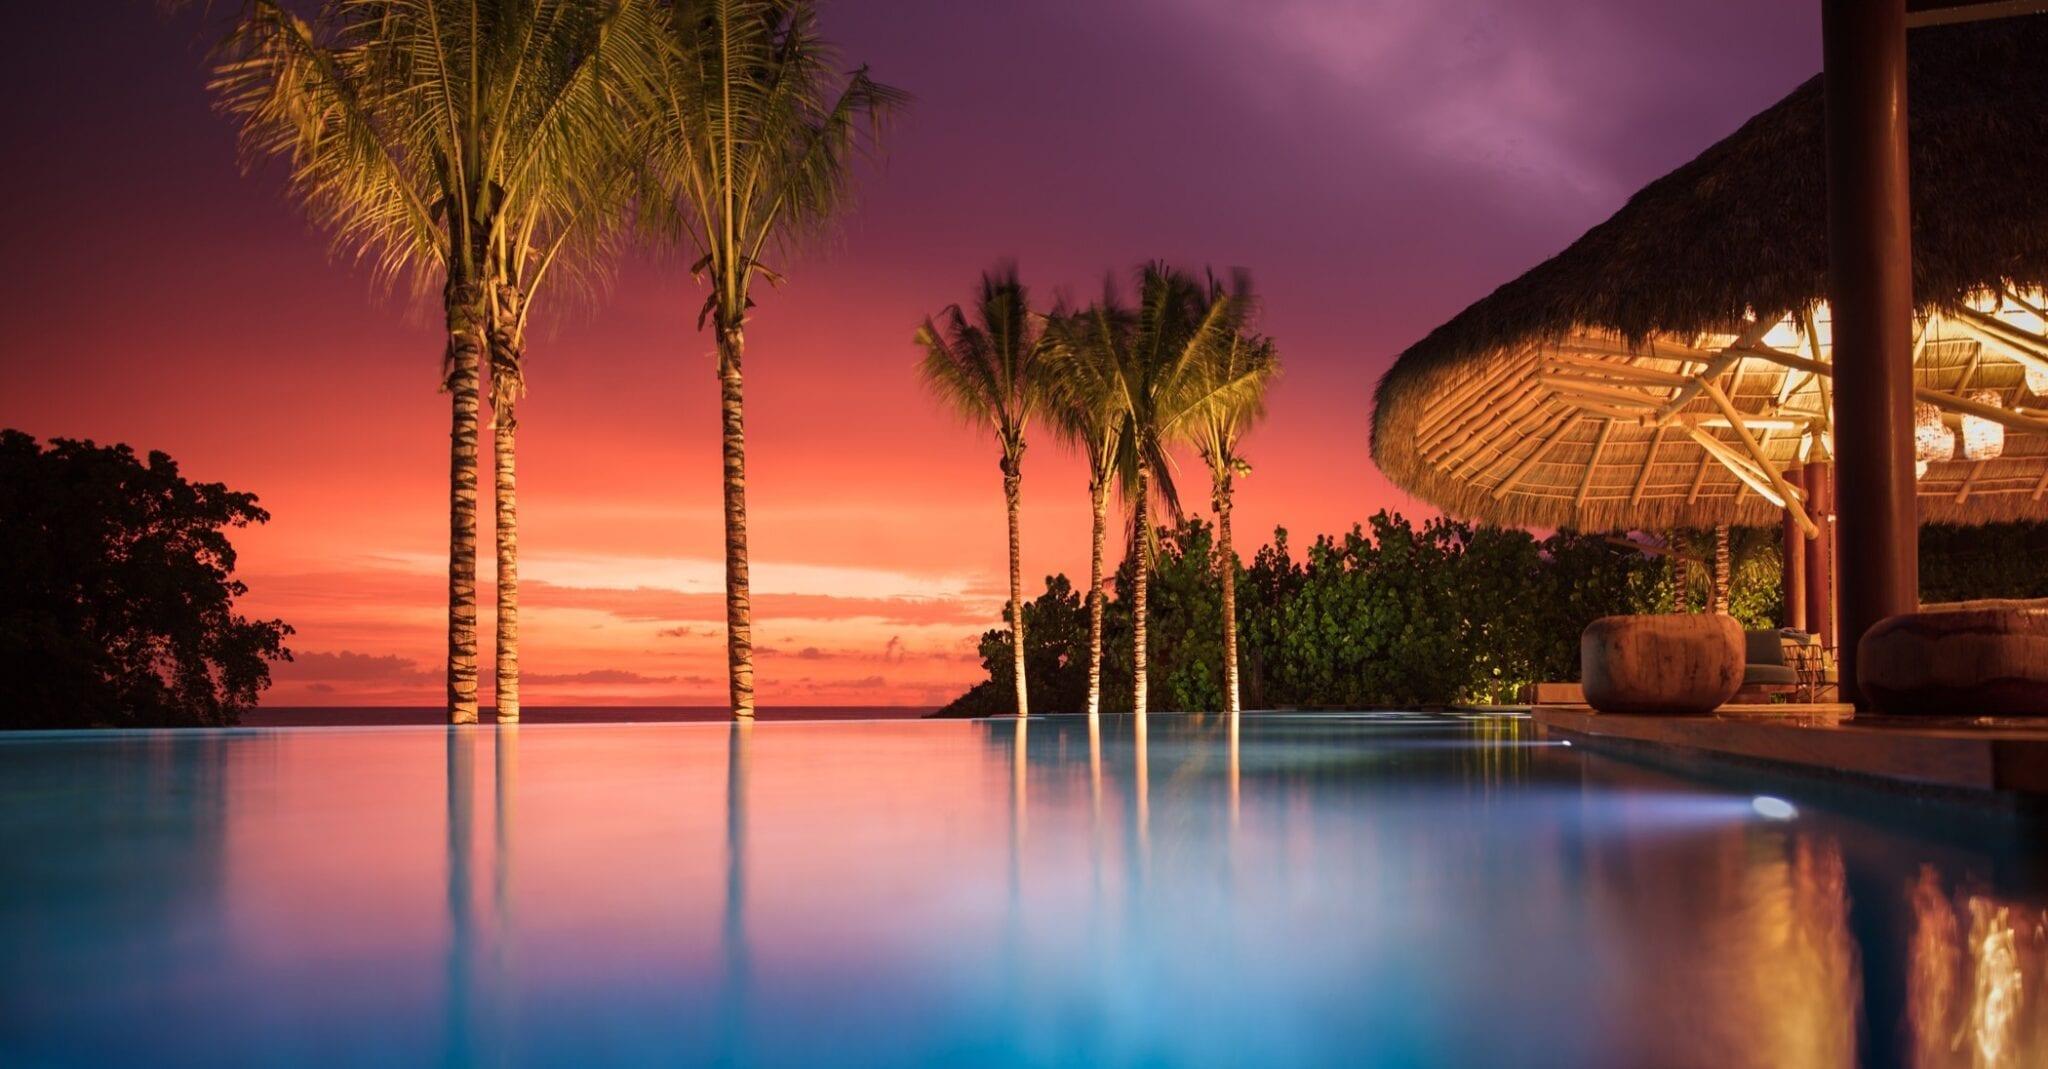 Casa Koko Pool Palapa Sunset